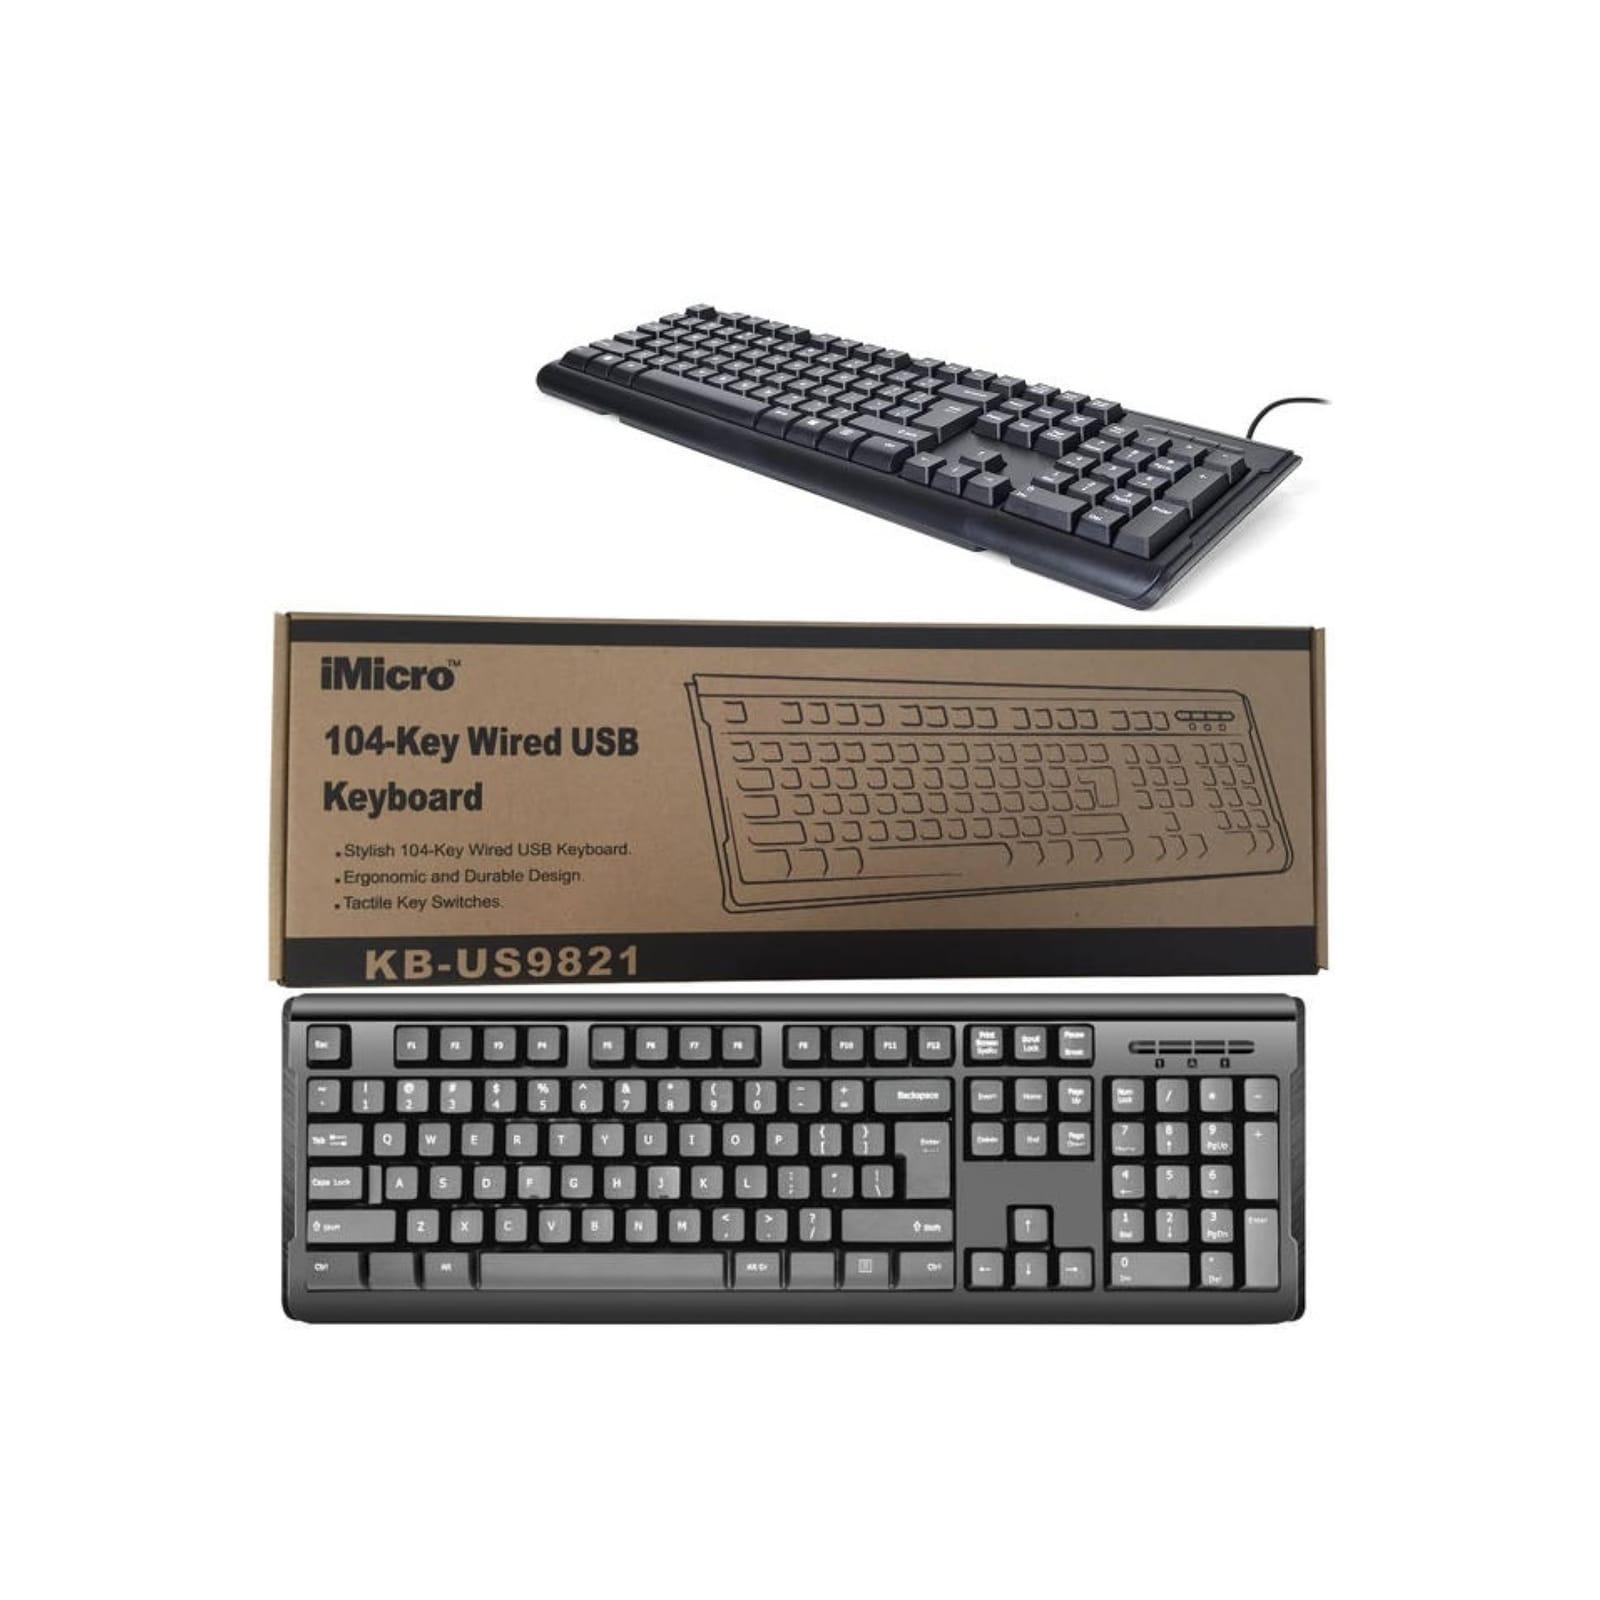 Shop HP Compaq dc7900 SFF Standard Refurb PC - Intel Core 2 Duo E8400 3.0  GHz 4GB DIMM DDR2 SATA 3.5